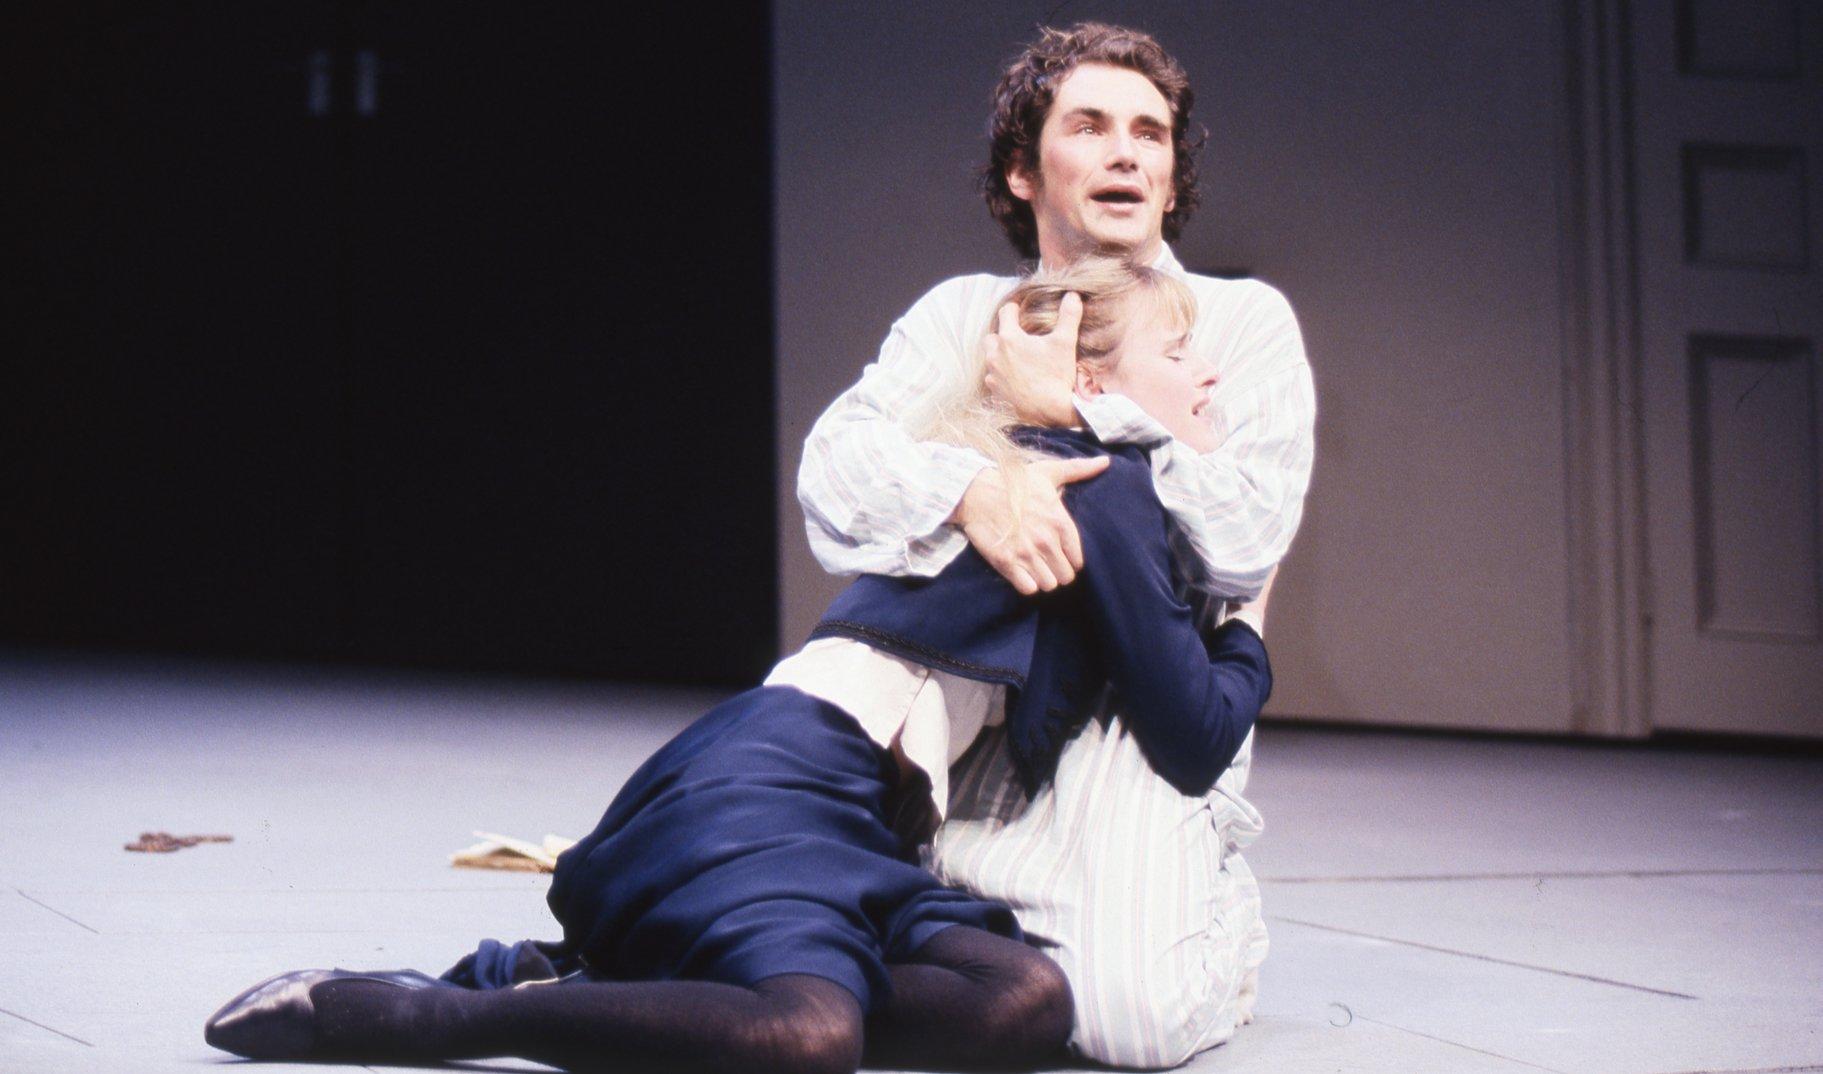 Hamlet embraces Ophelia.